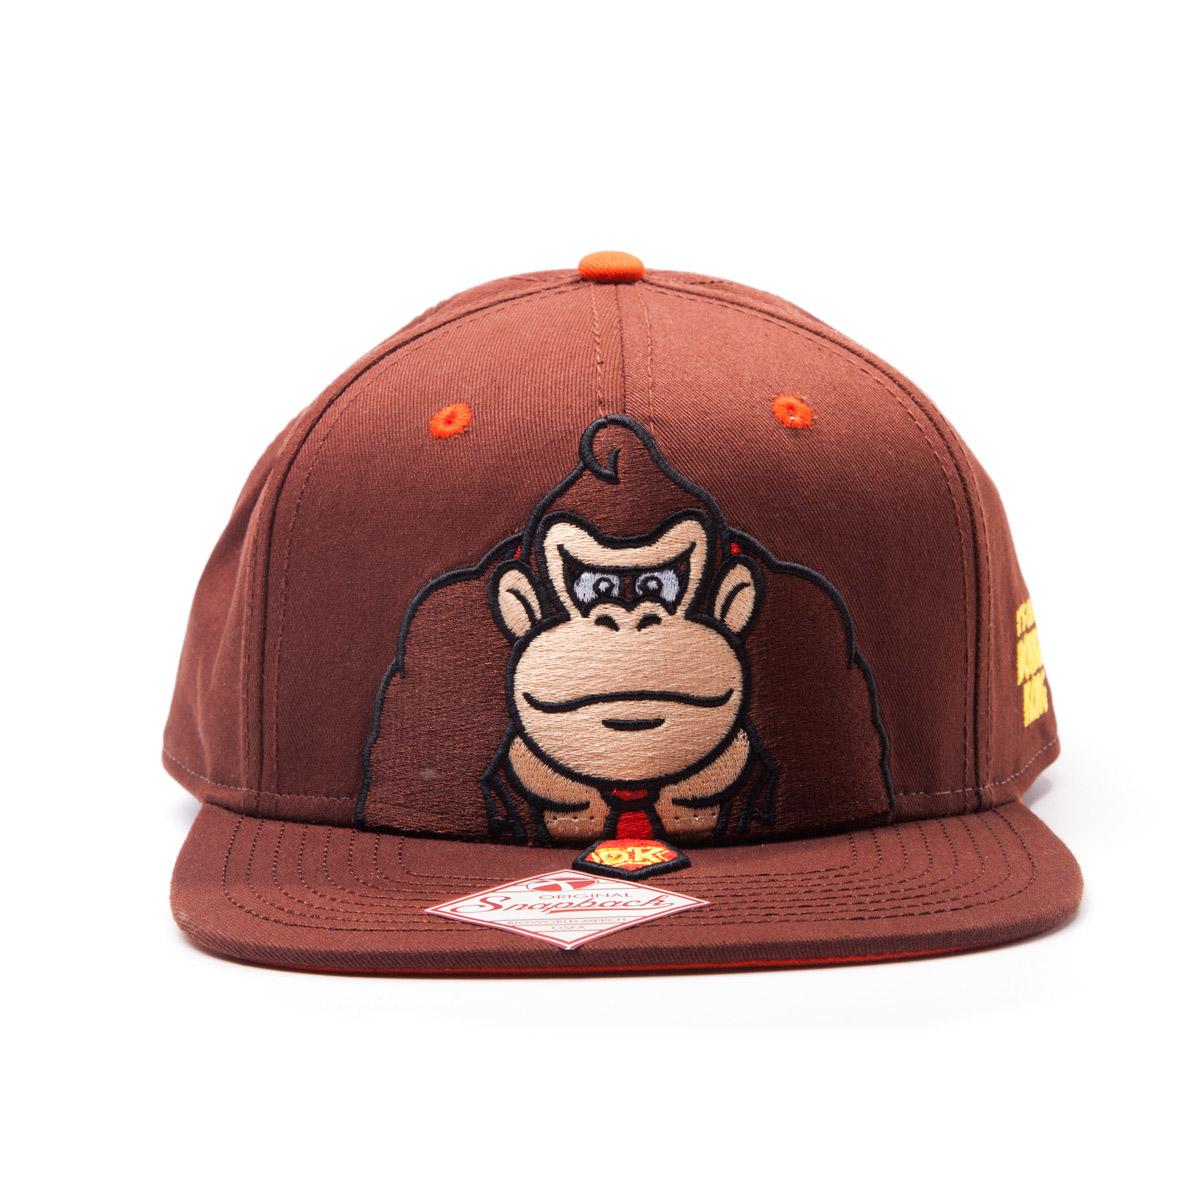 Bioworld Nintendo Donkey Kong, Brown Snap Back (SB201437NTN)